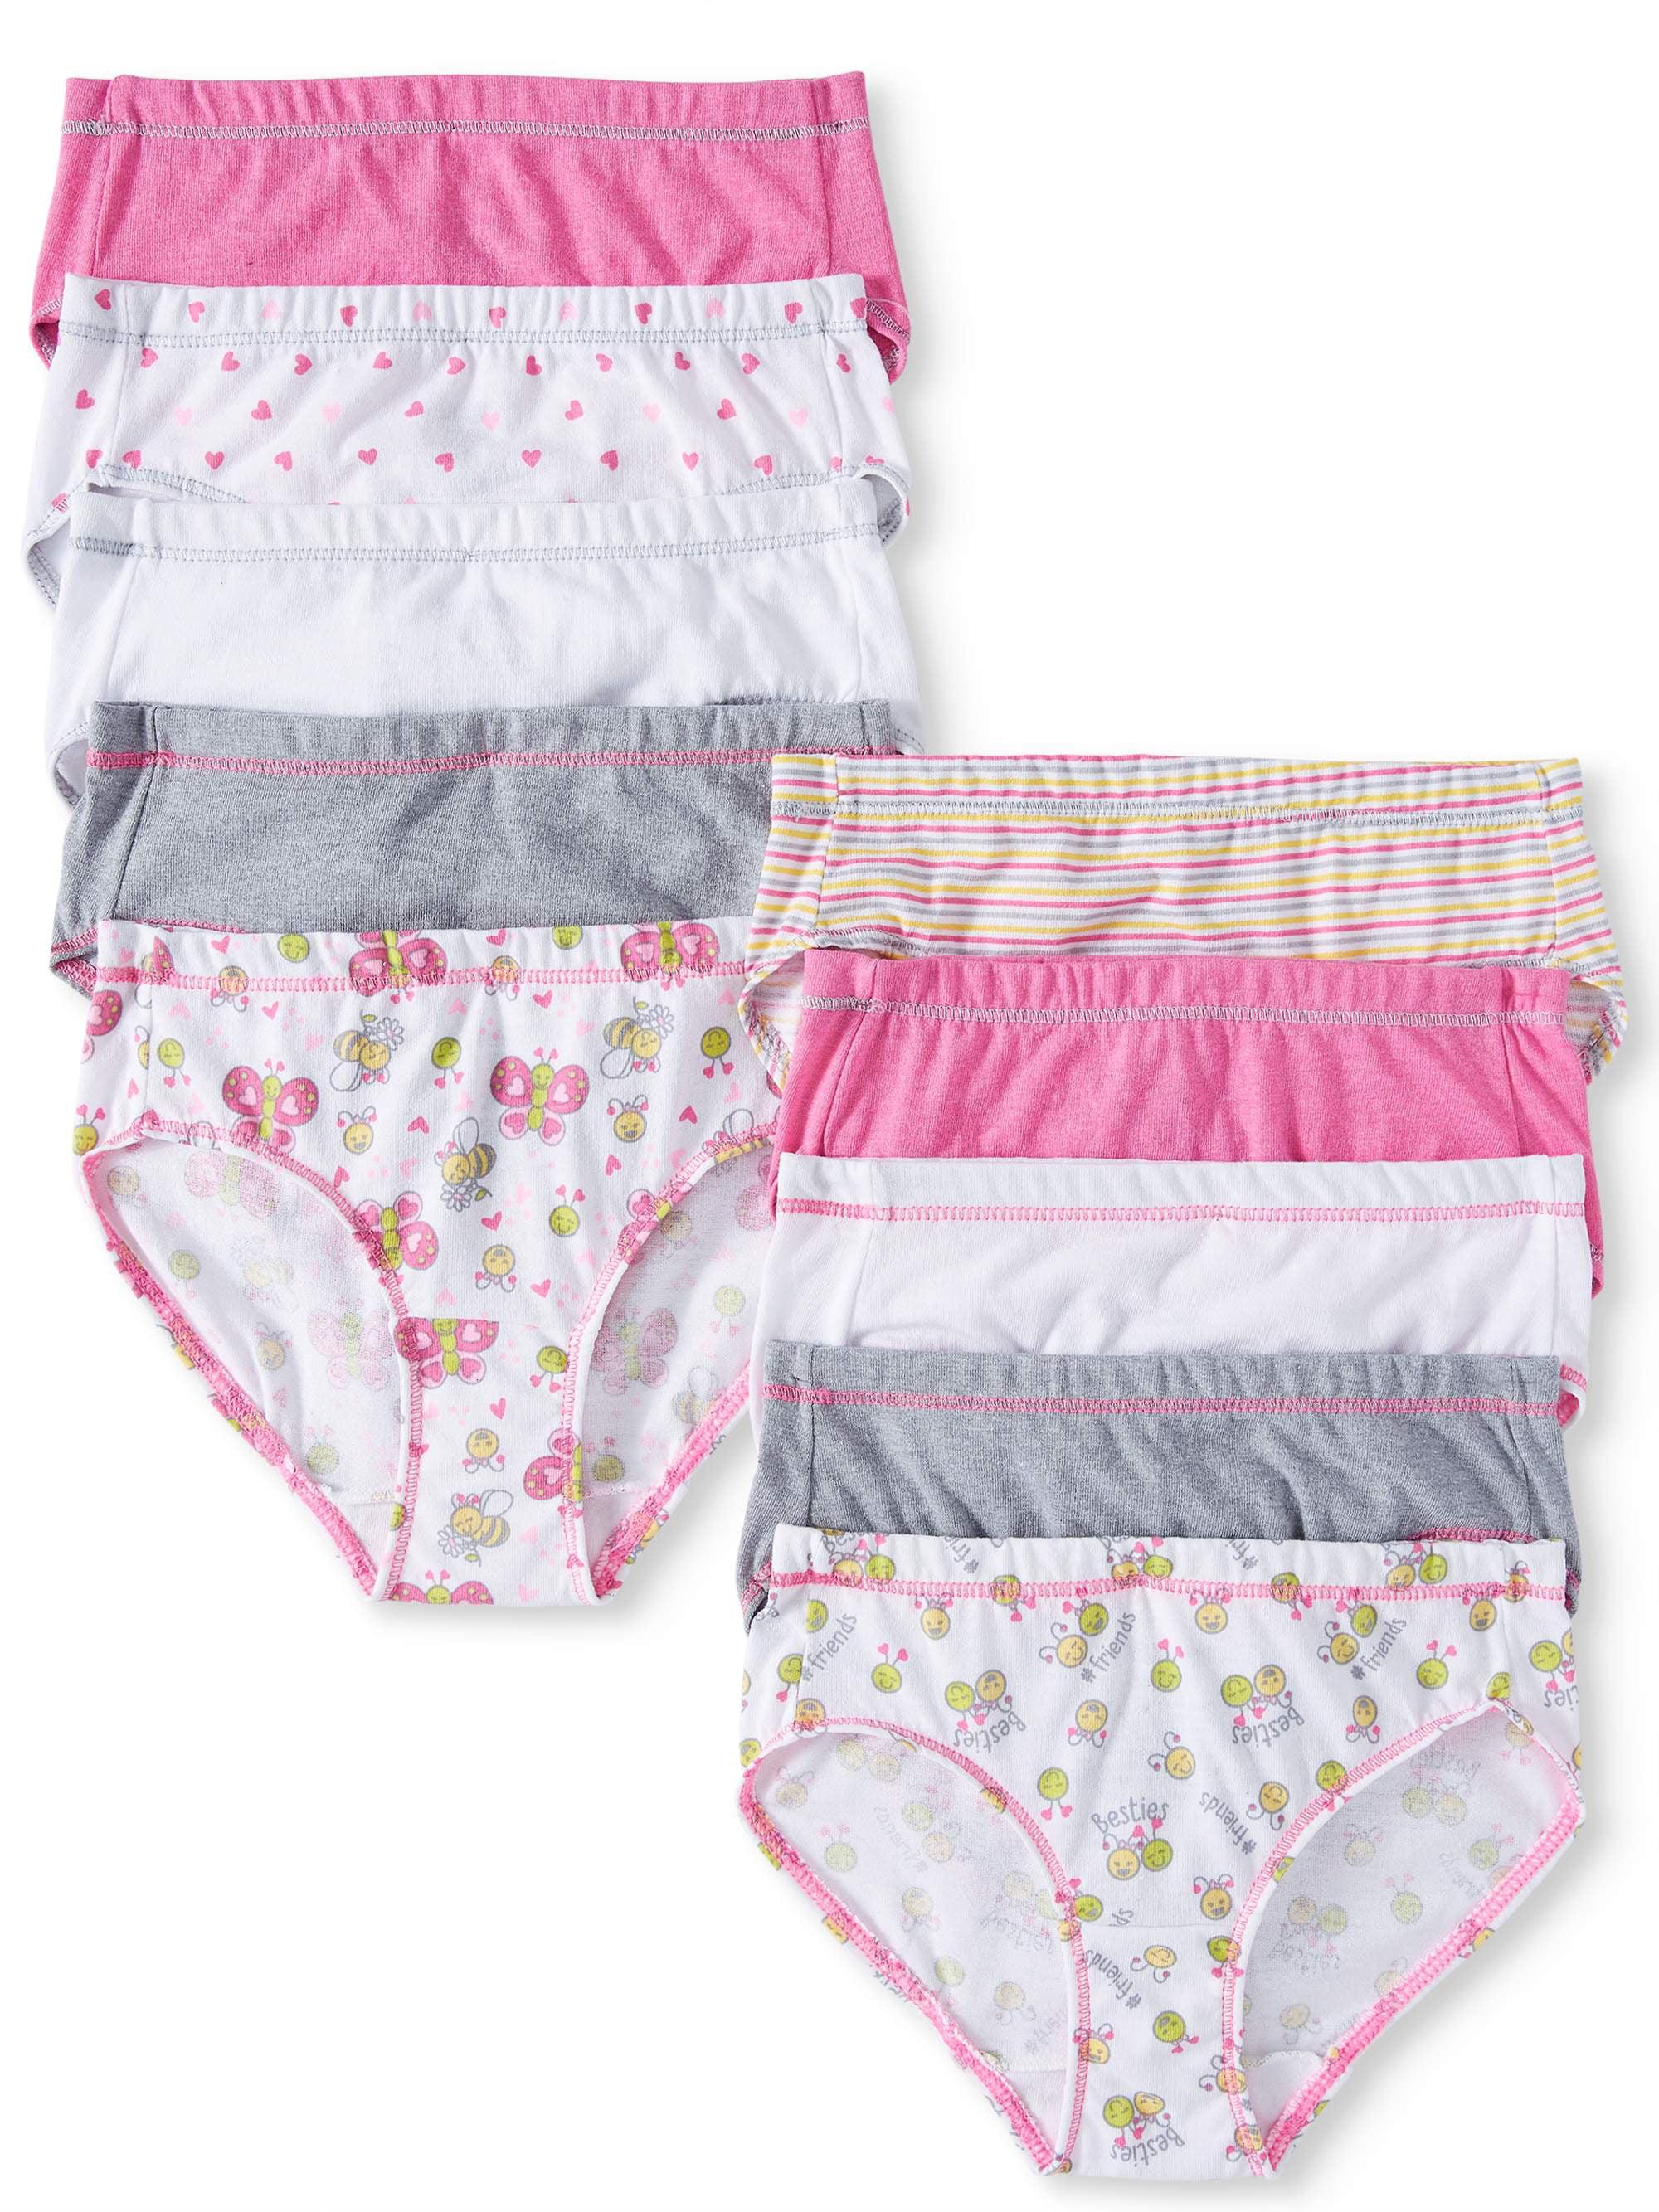 EcoSmart Tagless Briefs, 10 Pack (Toddler Girls)